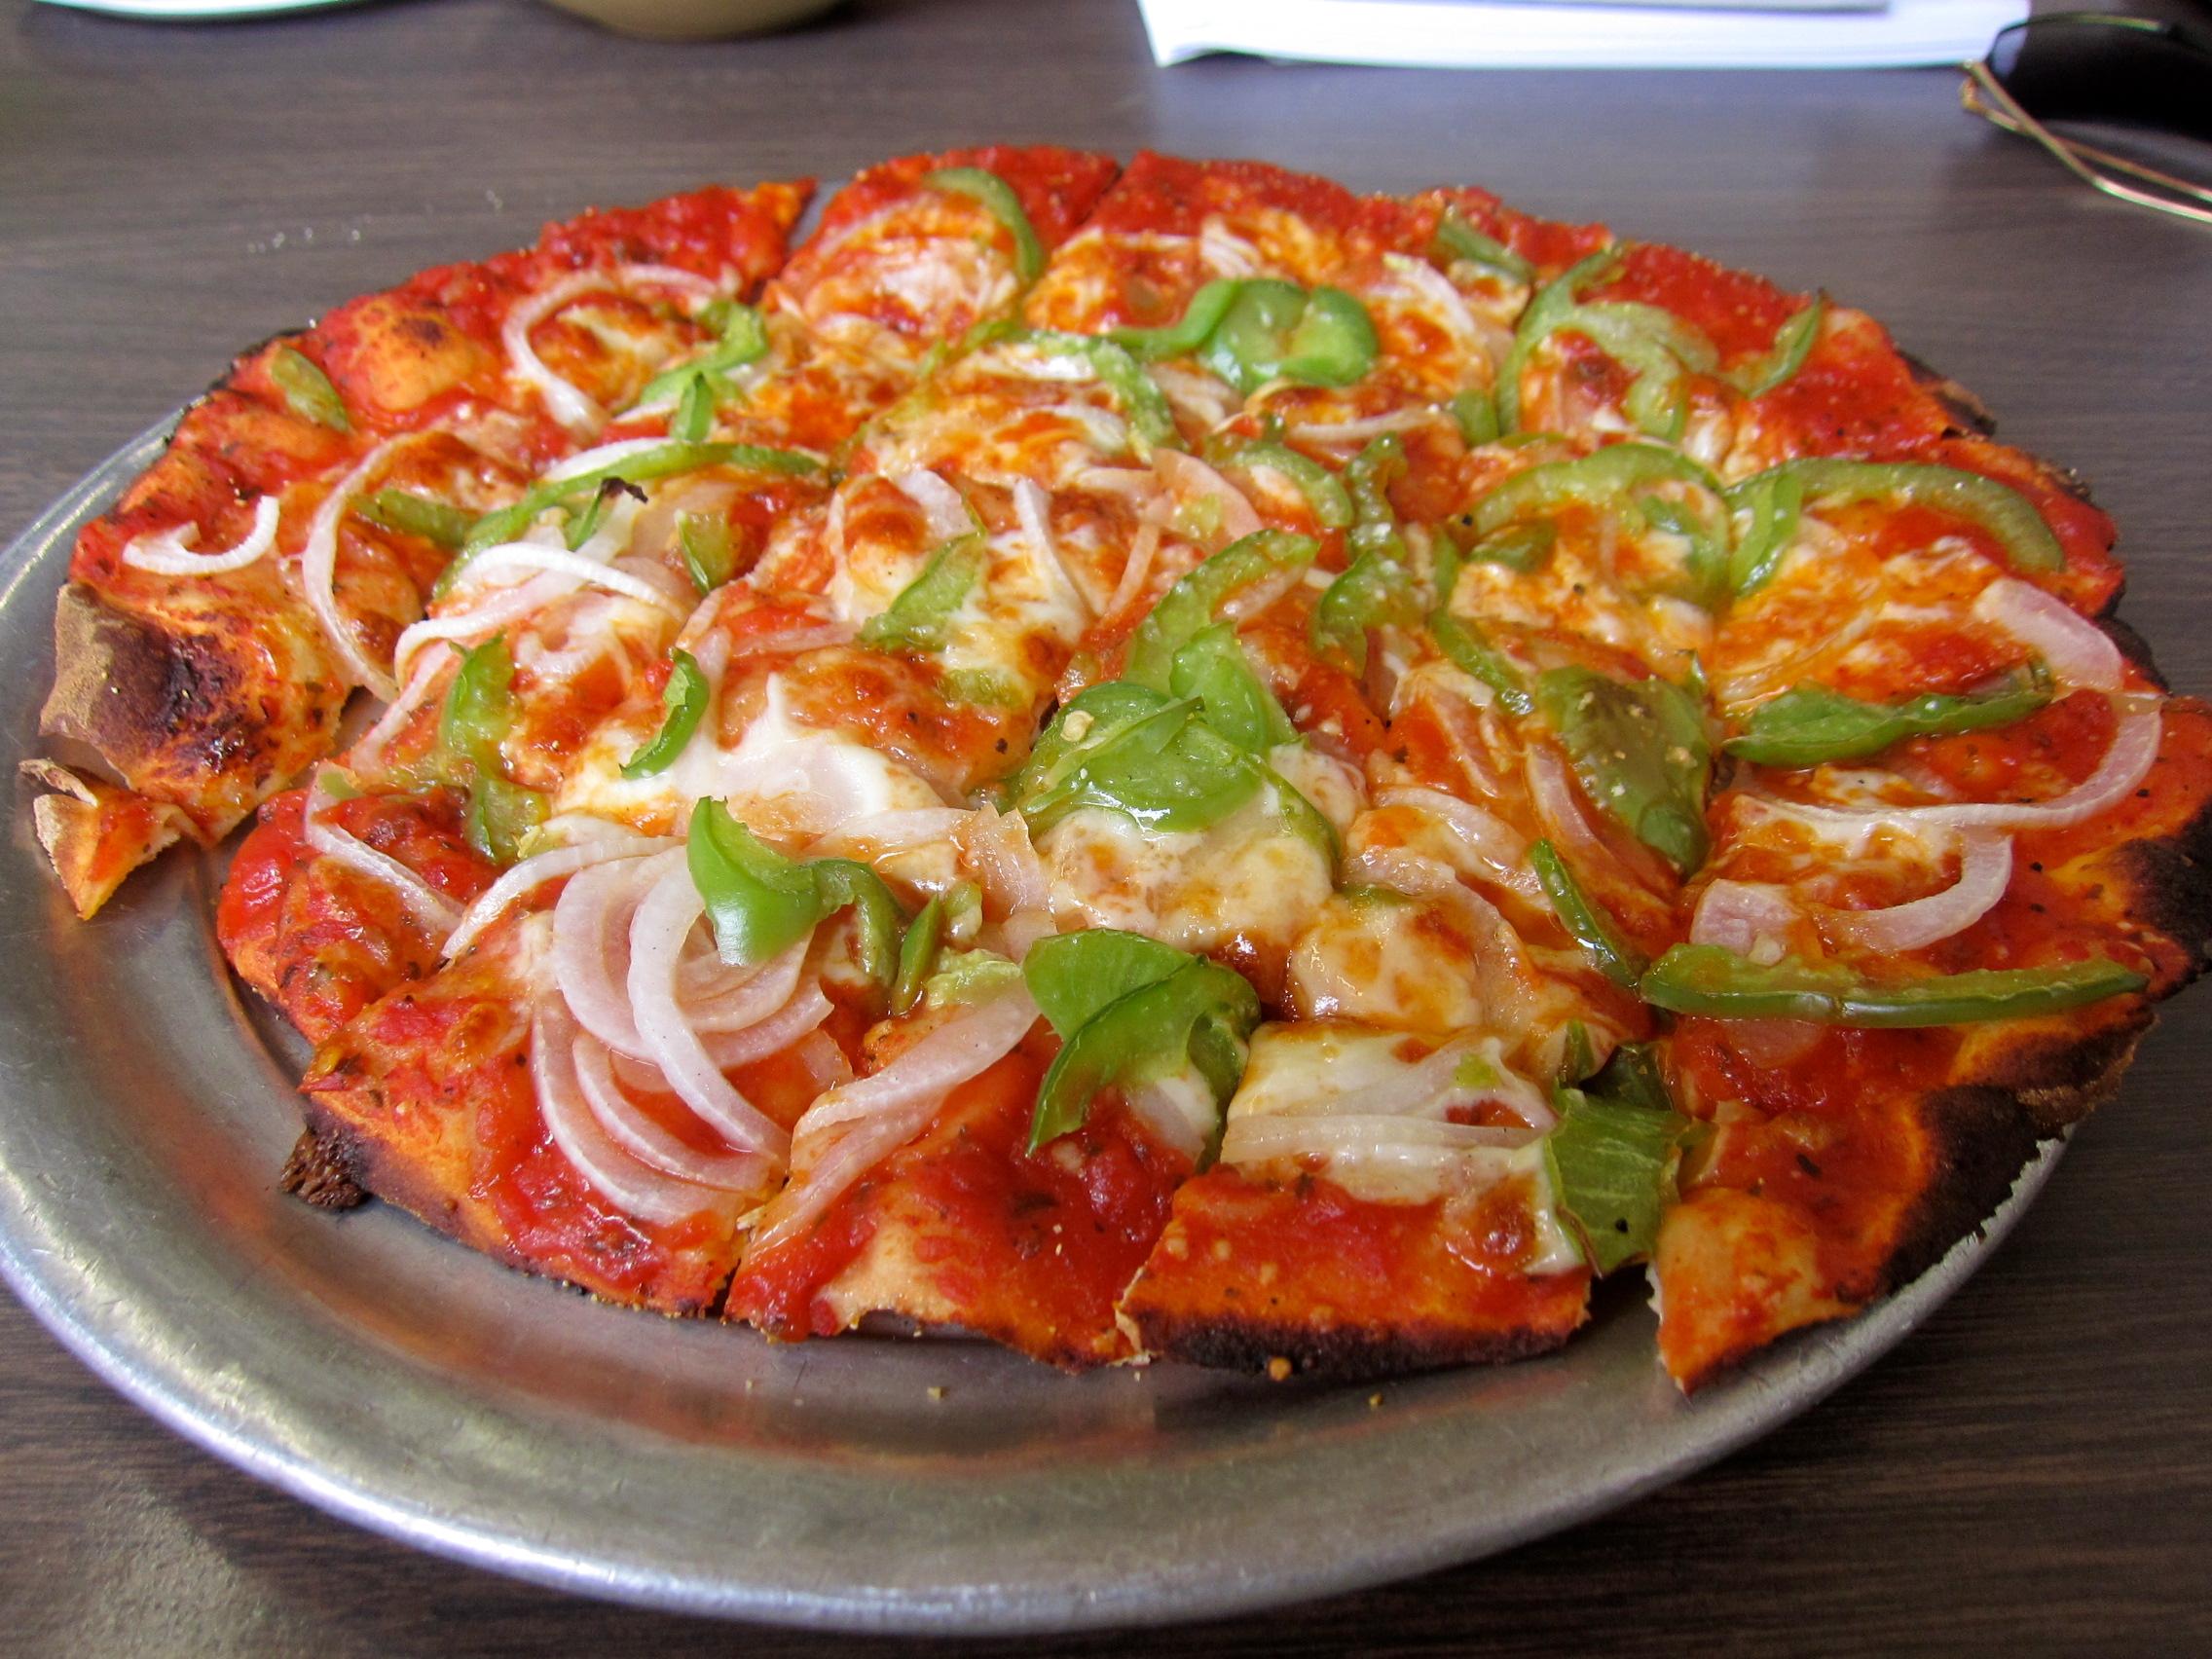 REVIEW RUBINO S PIZZA